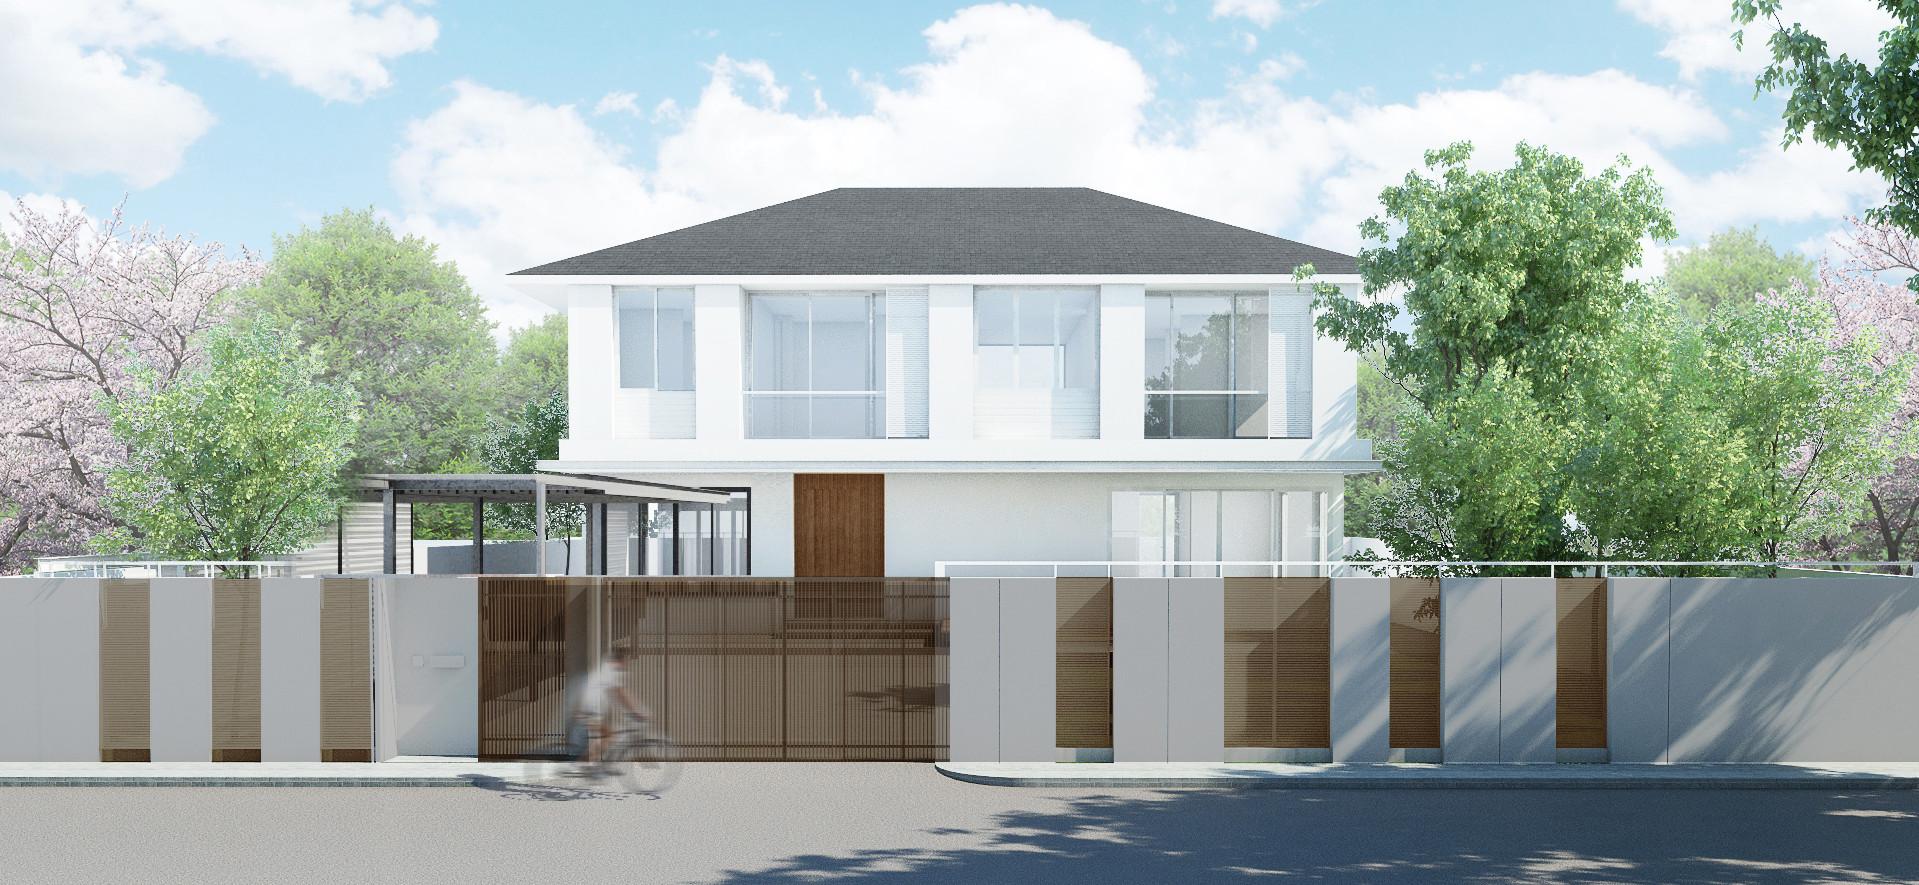 PAT&ART HOUSE